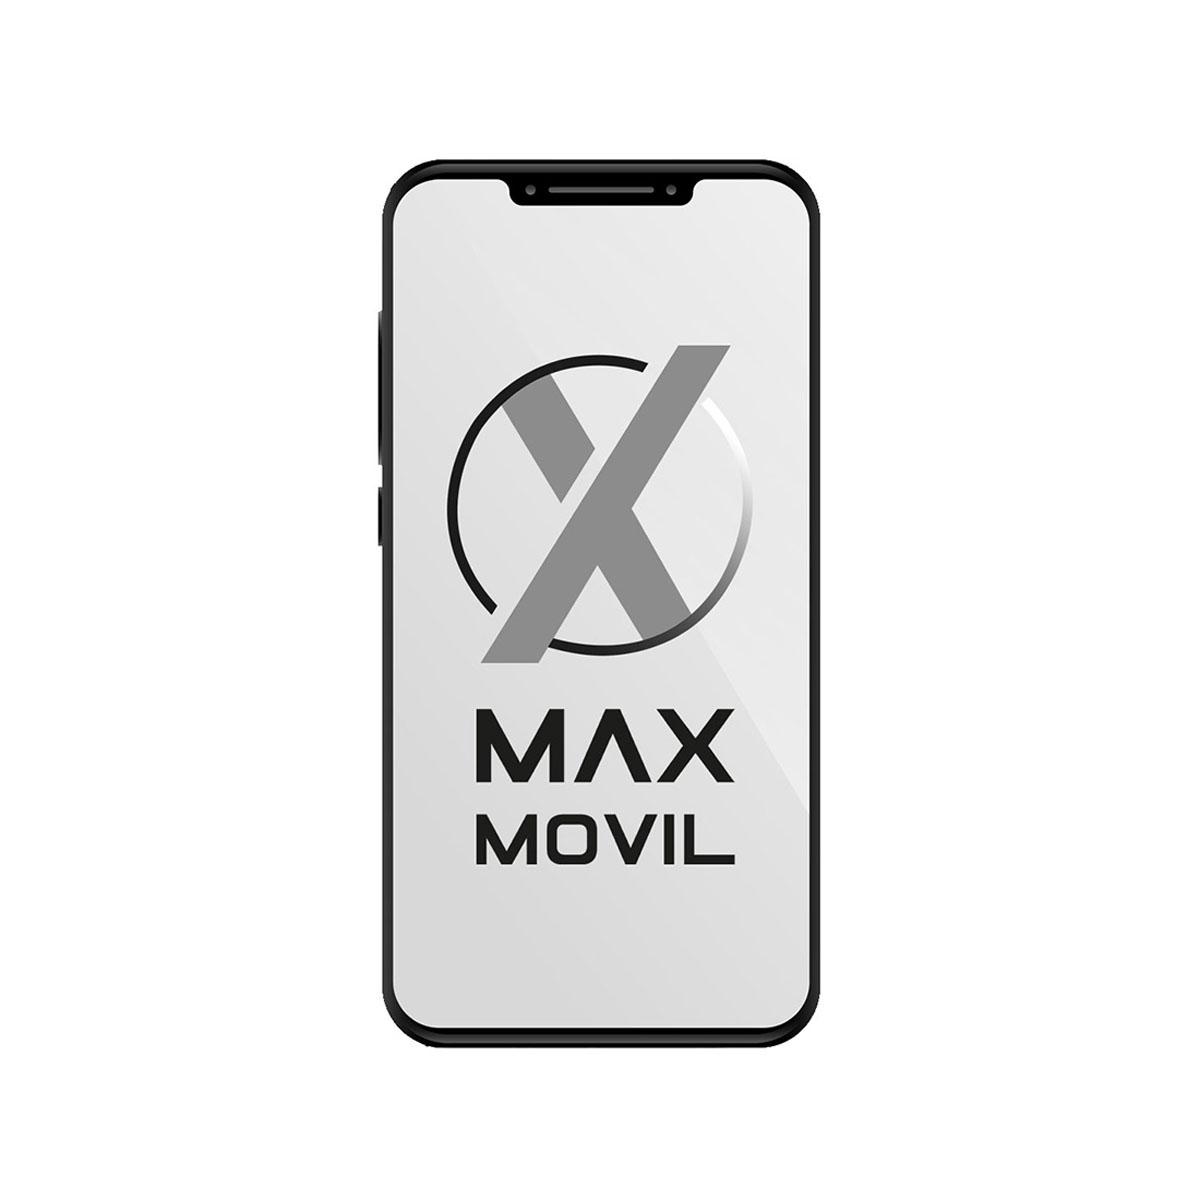 Samsung Galaxy S4 Mini i9195 negro Caja deteriorada